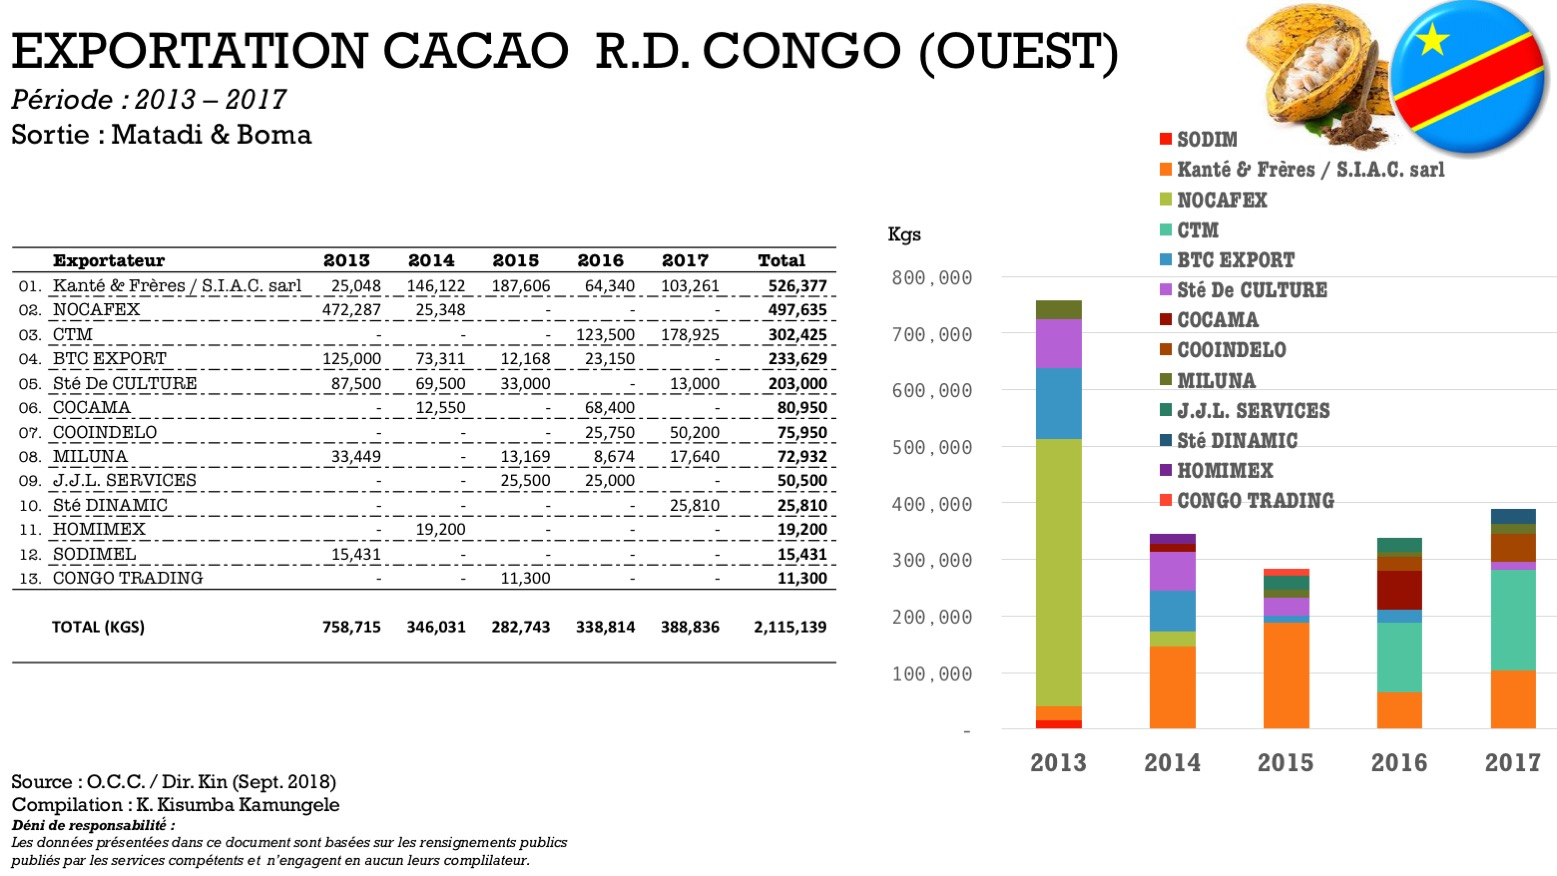 Blog ASSECCAF Cacao Congo: Exportation Cacao de l'Ouest de ...